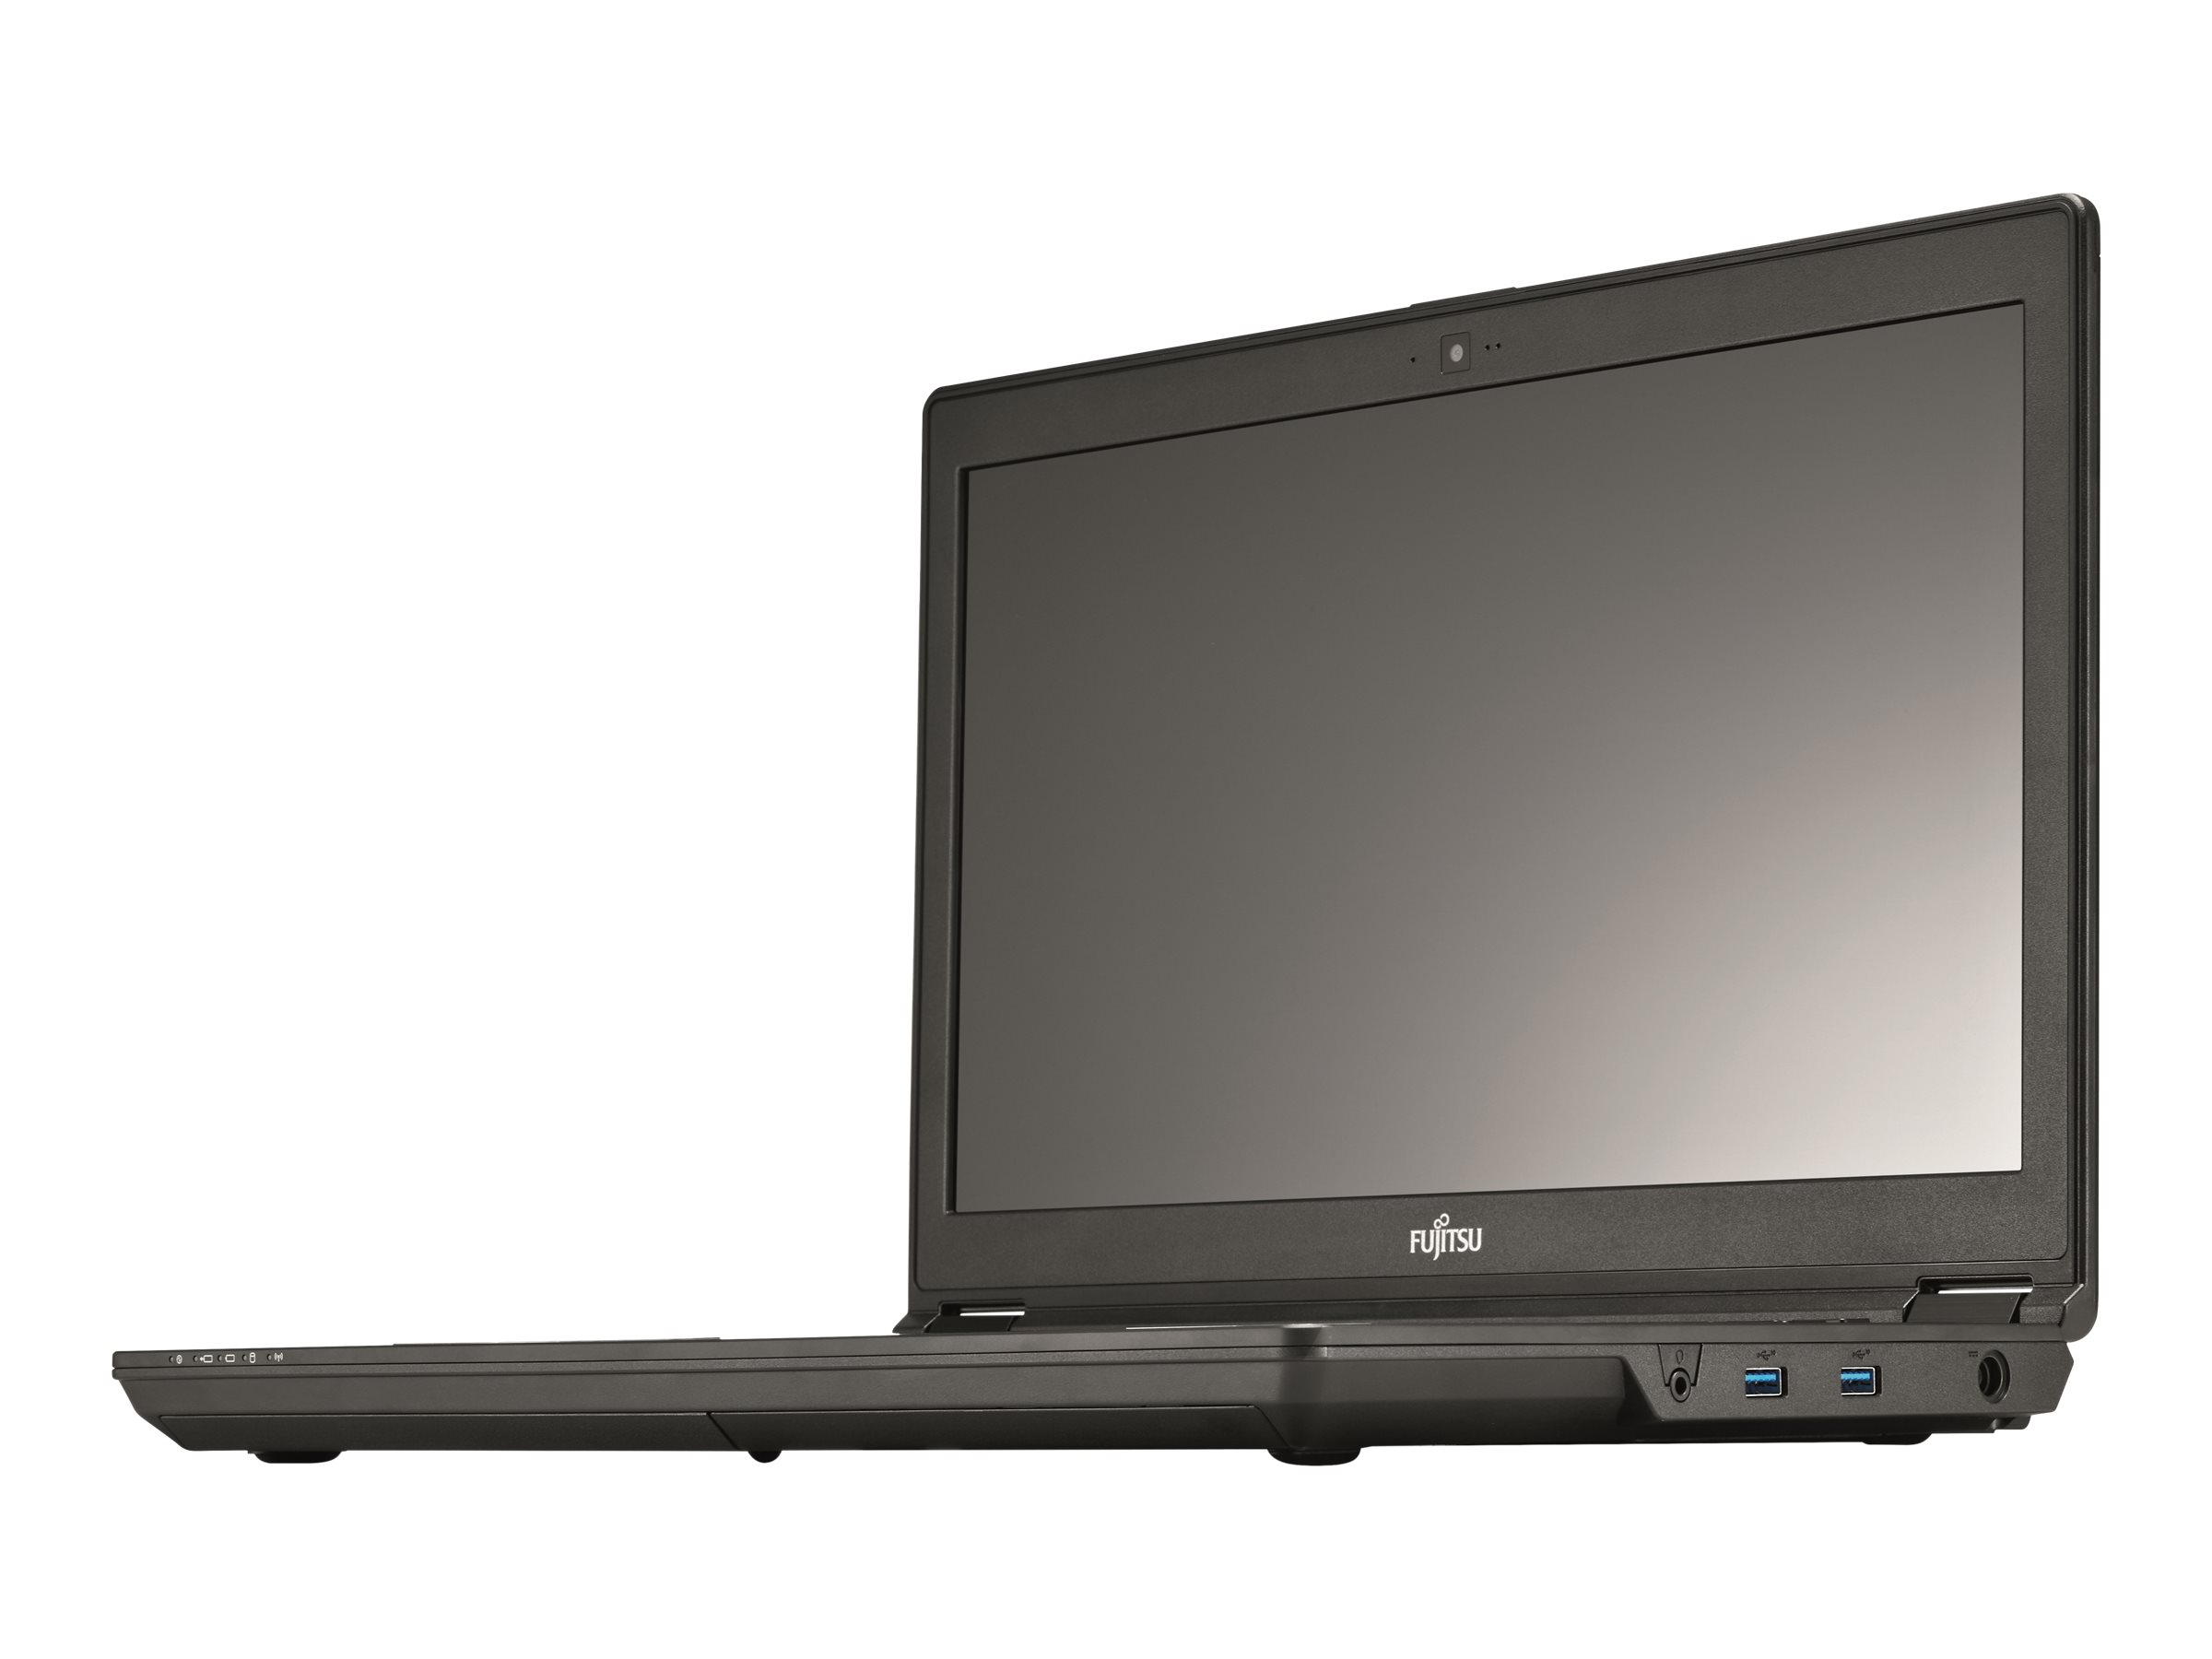 "Fujitsu CELSIUS Mobile H780 - Core i7 8750H / 2.2 GHz - Win 10 Pro - 16 GB RAM - 256 GB SSD + 1 TB HDD - 39.6 cm (15.6"")"